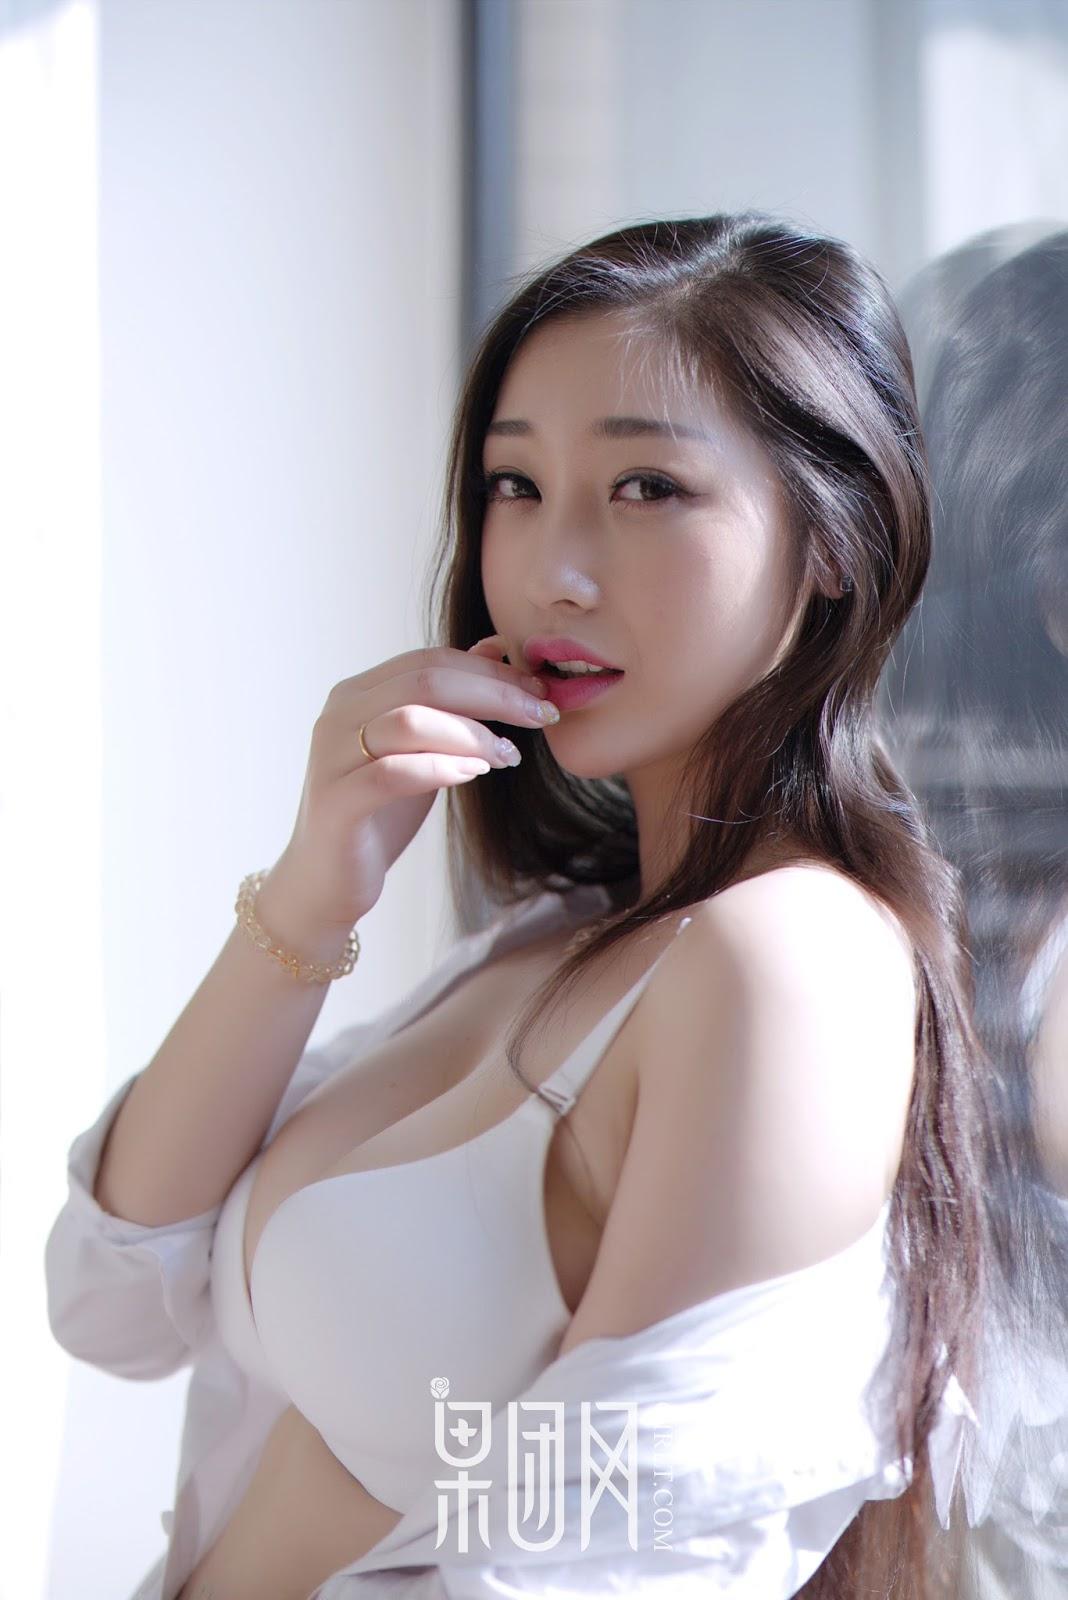 GIRLT - No.082 Daji_Toxic (46 pics)